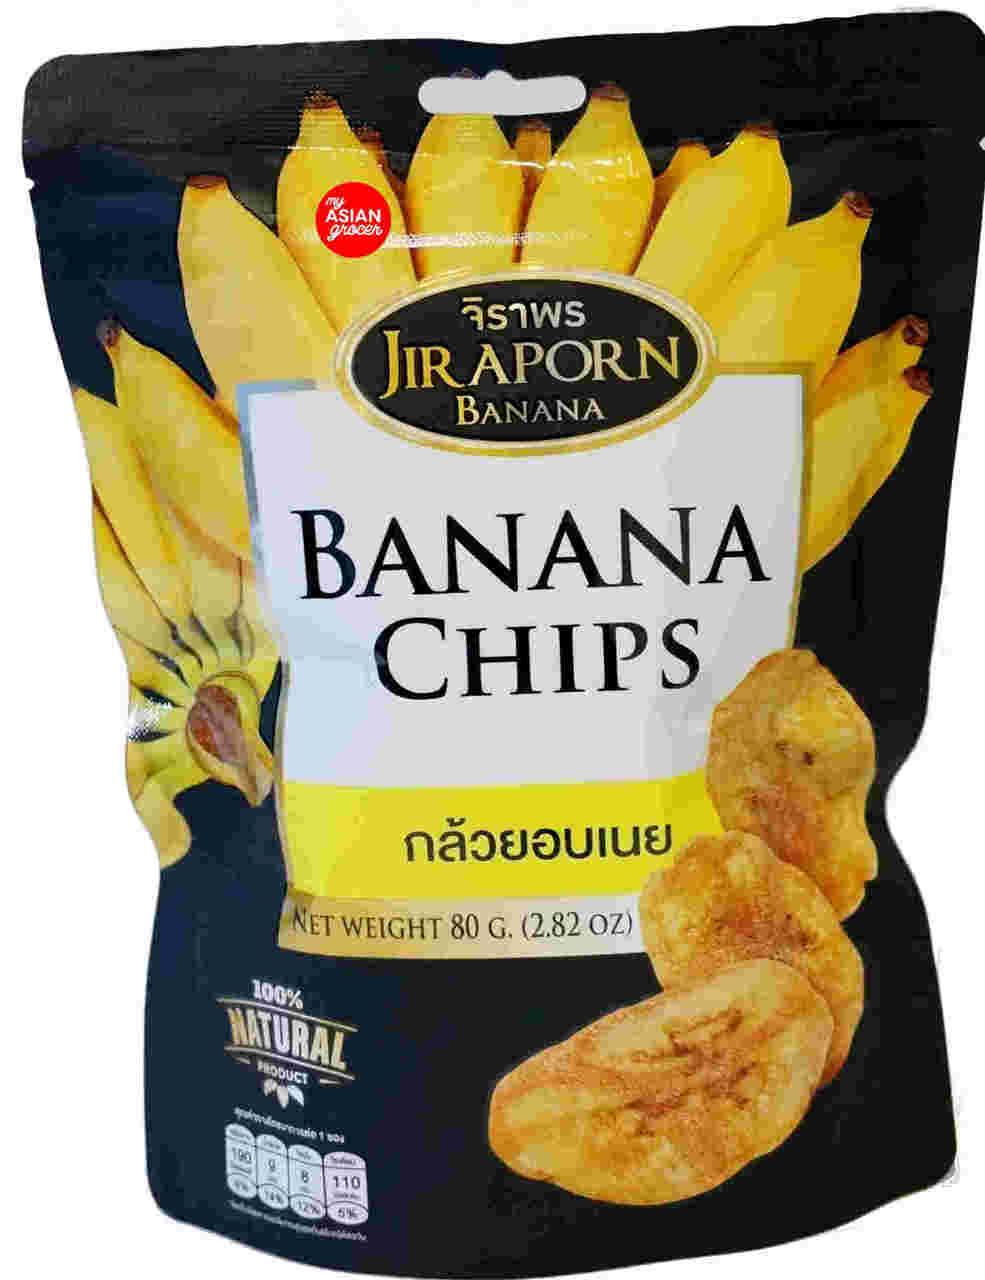 medium jiraporn banana chips 282 oz 7tqzphOTl